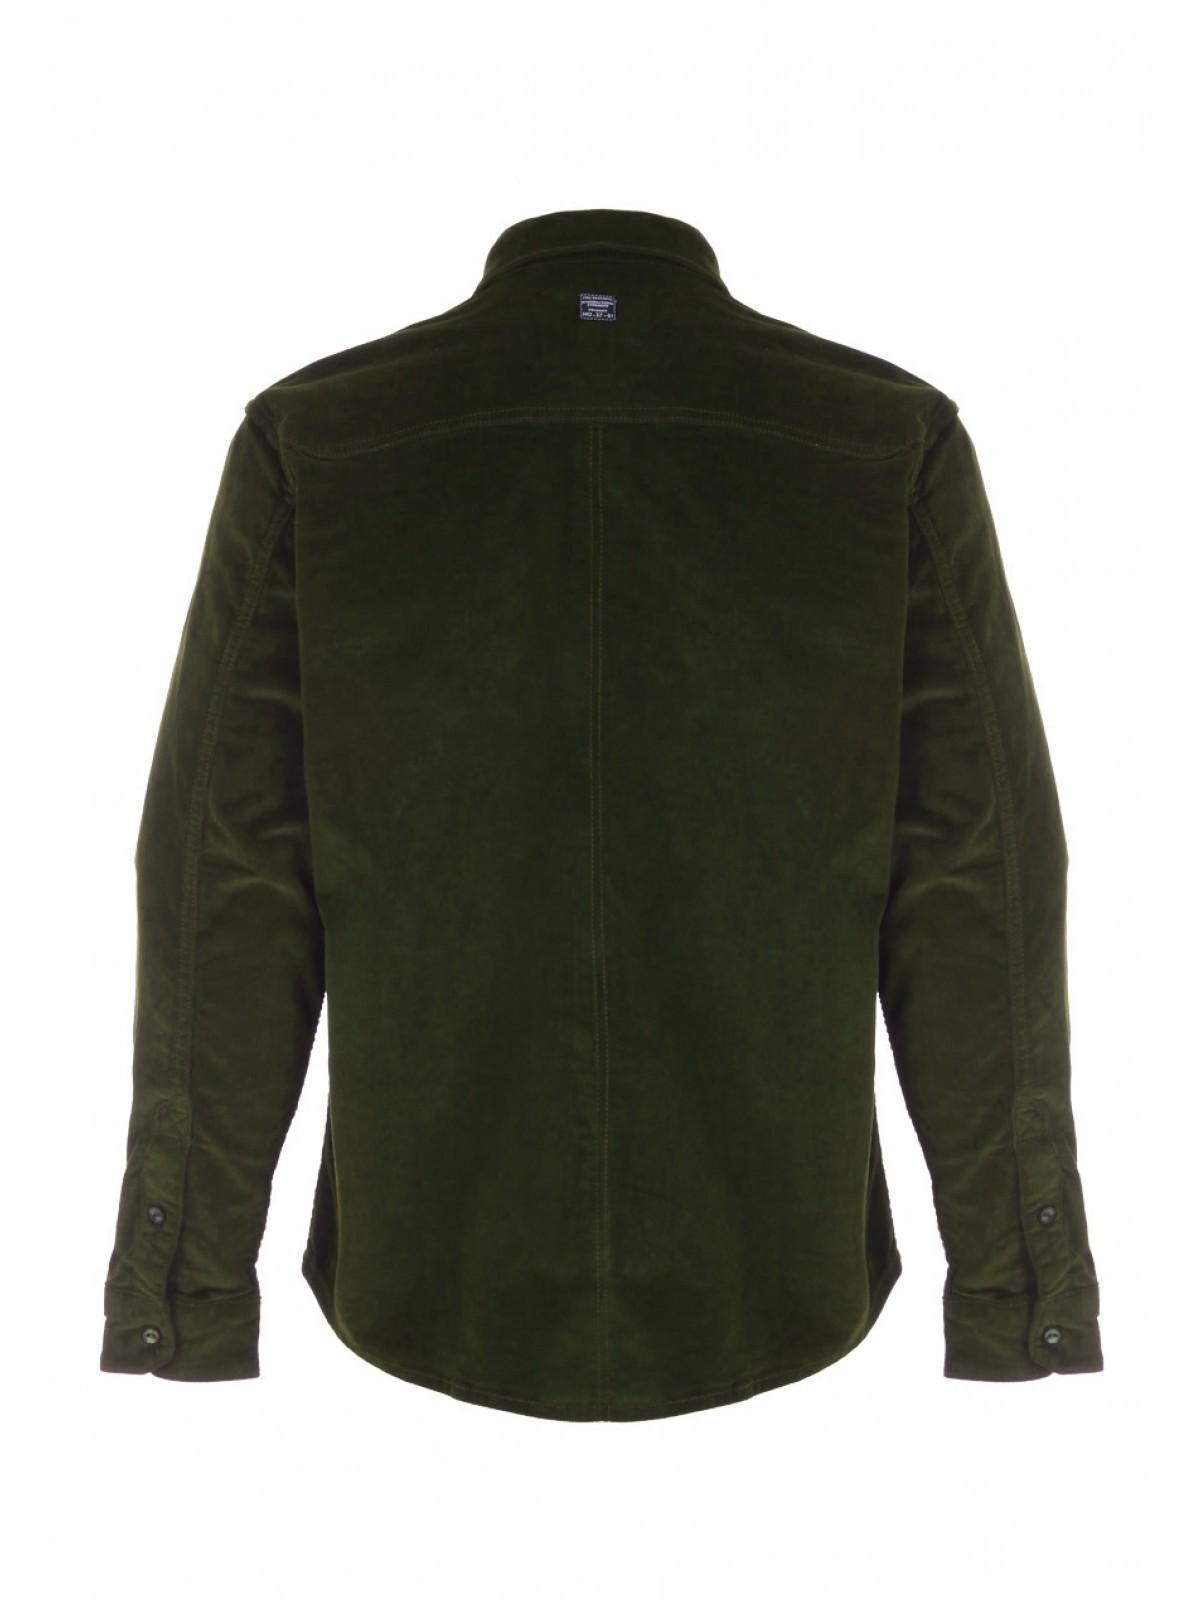 2697e176d607 Mens Dark Green Cord Long Sleeve Shirt   Peacocks